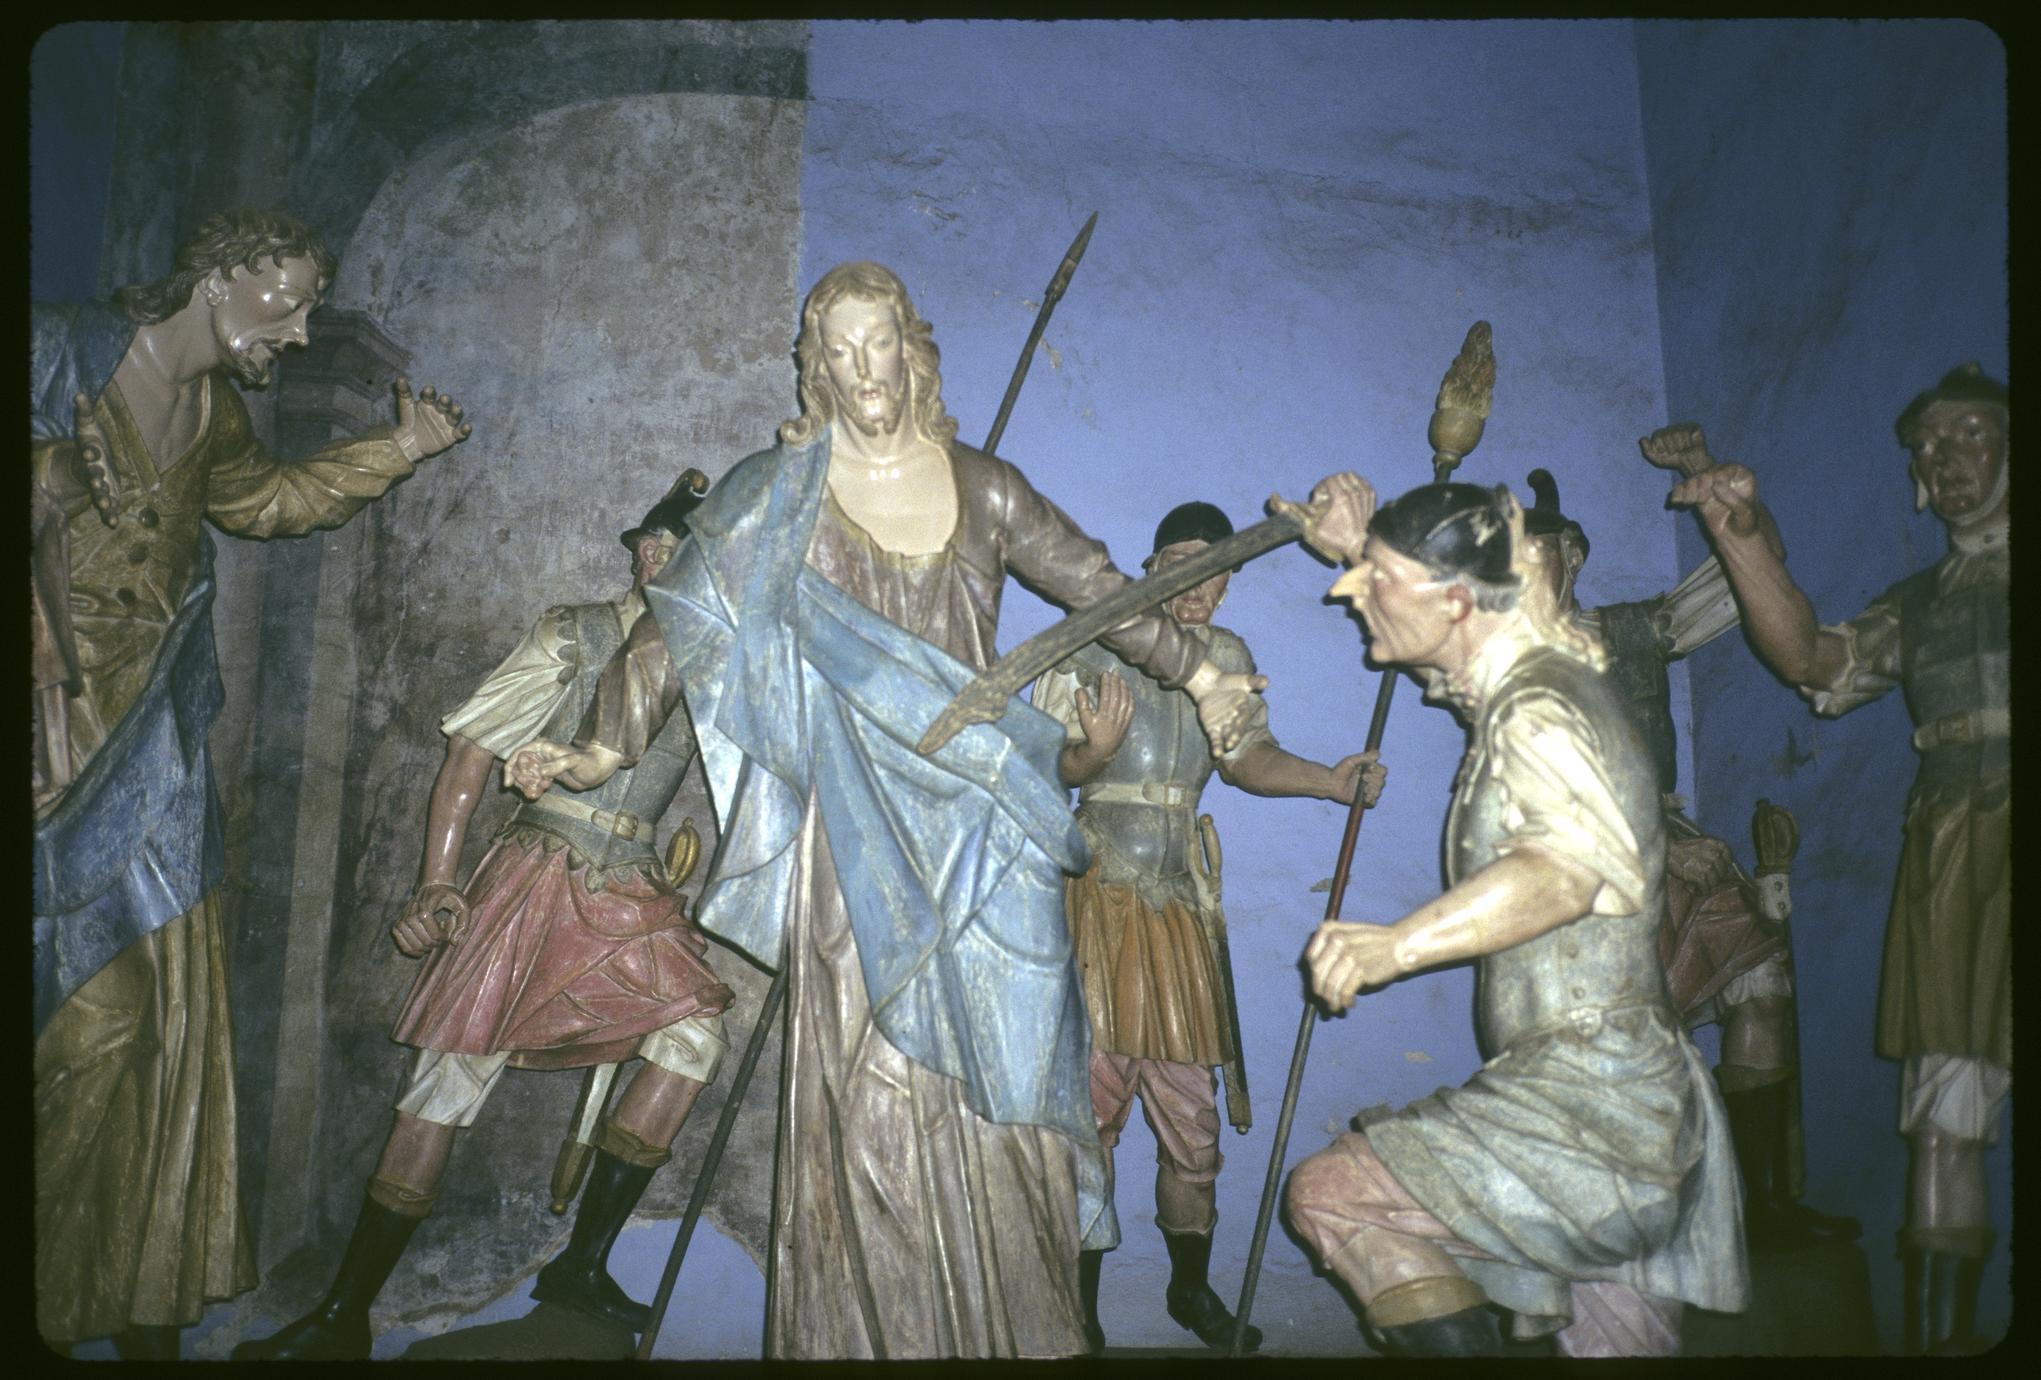 Sculptural group by Aleijandinho, interior Congonhas Basilica (1 of 4)